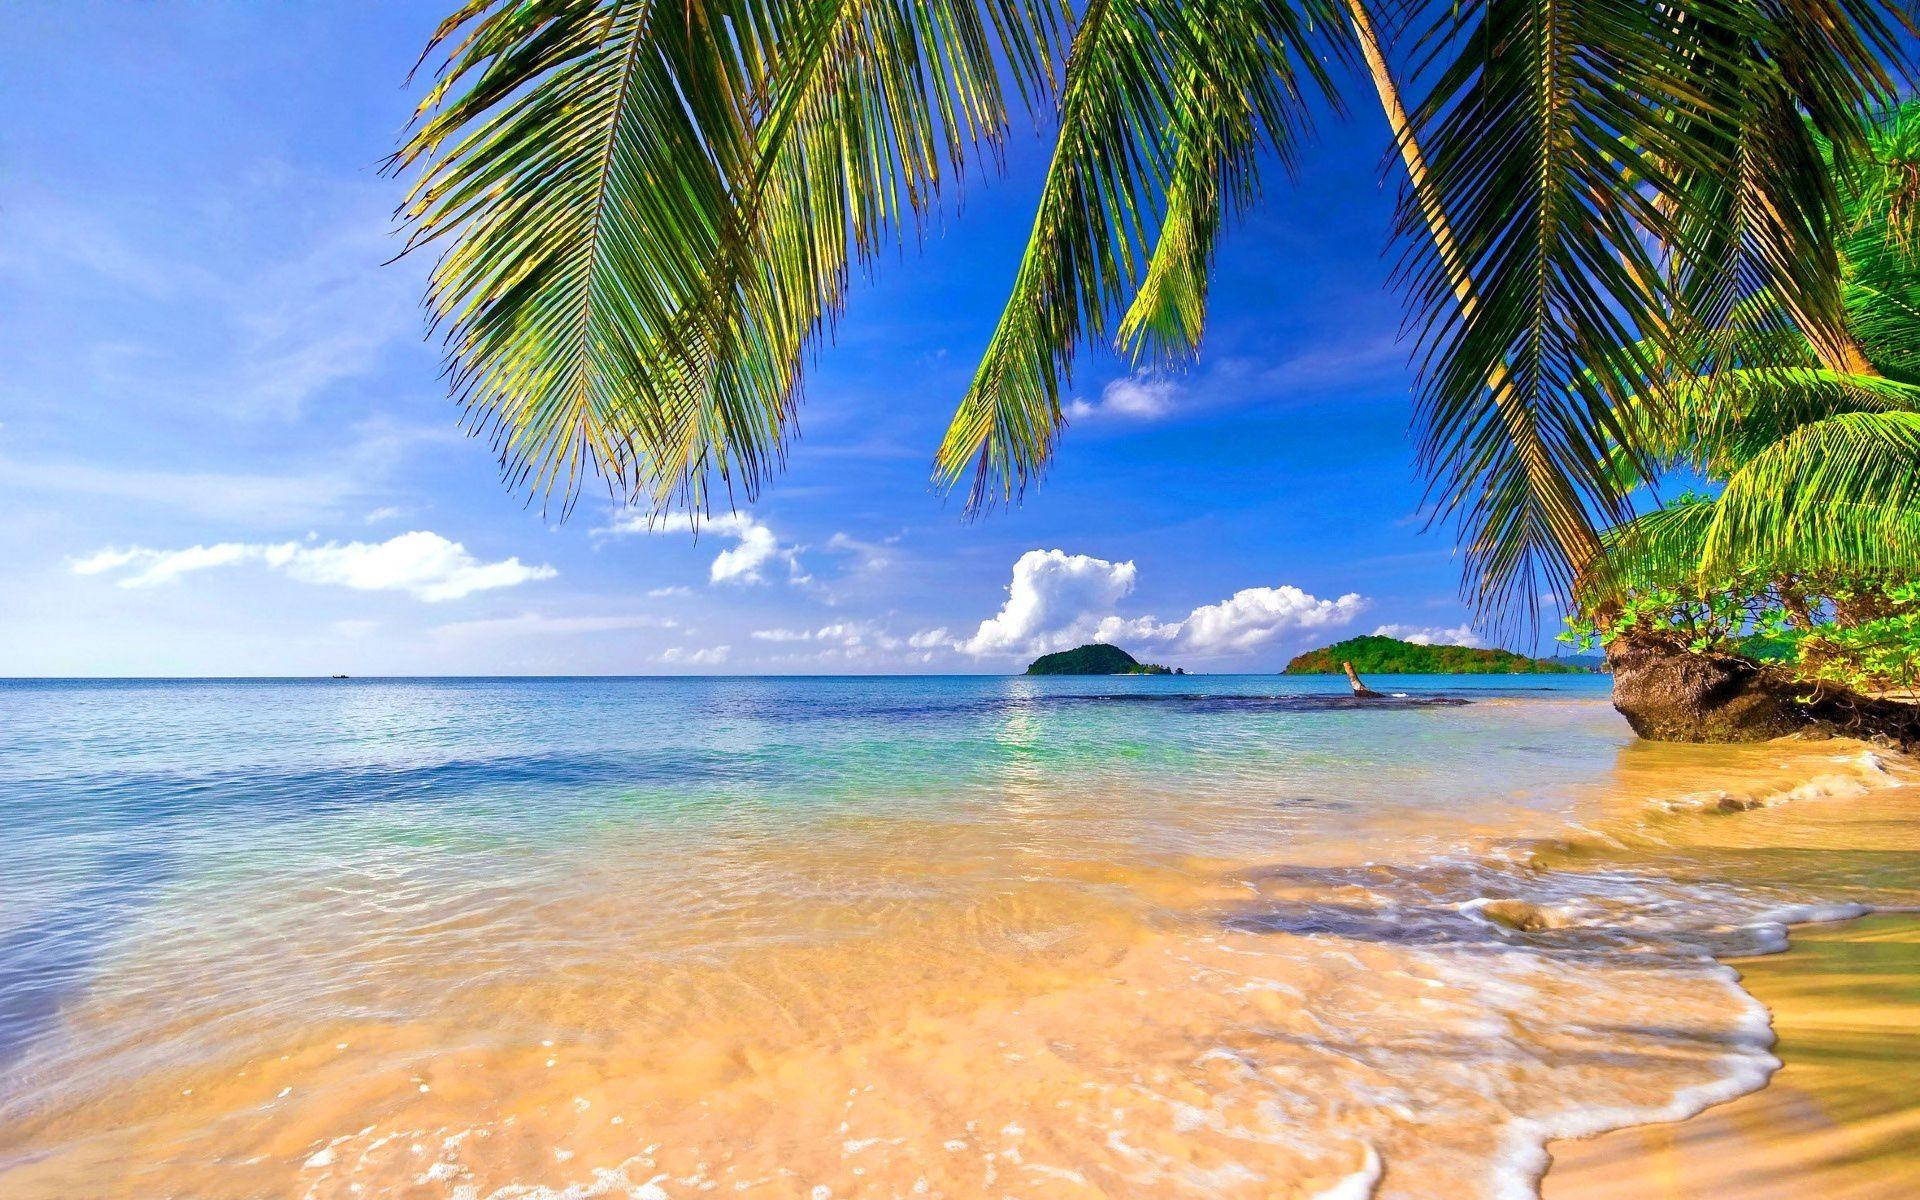 Beach tropical hd Wallpapers